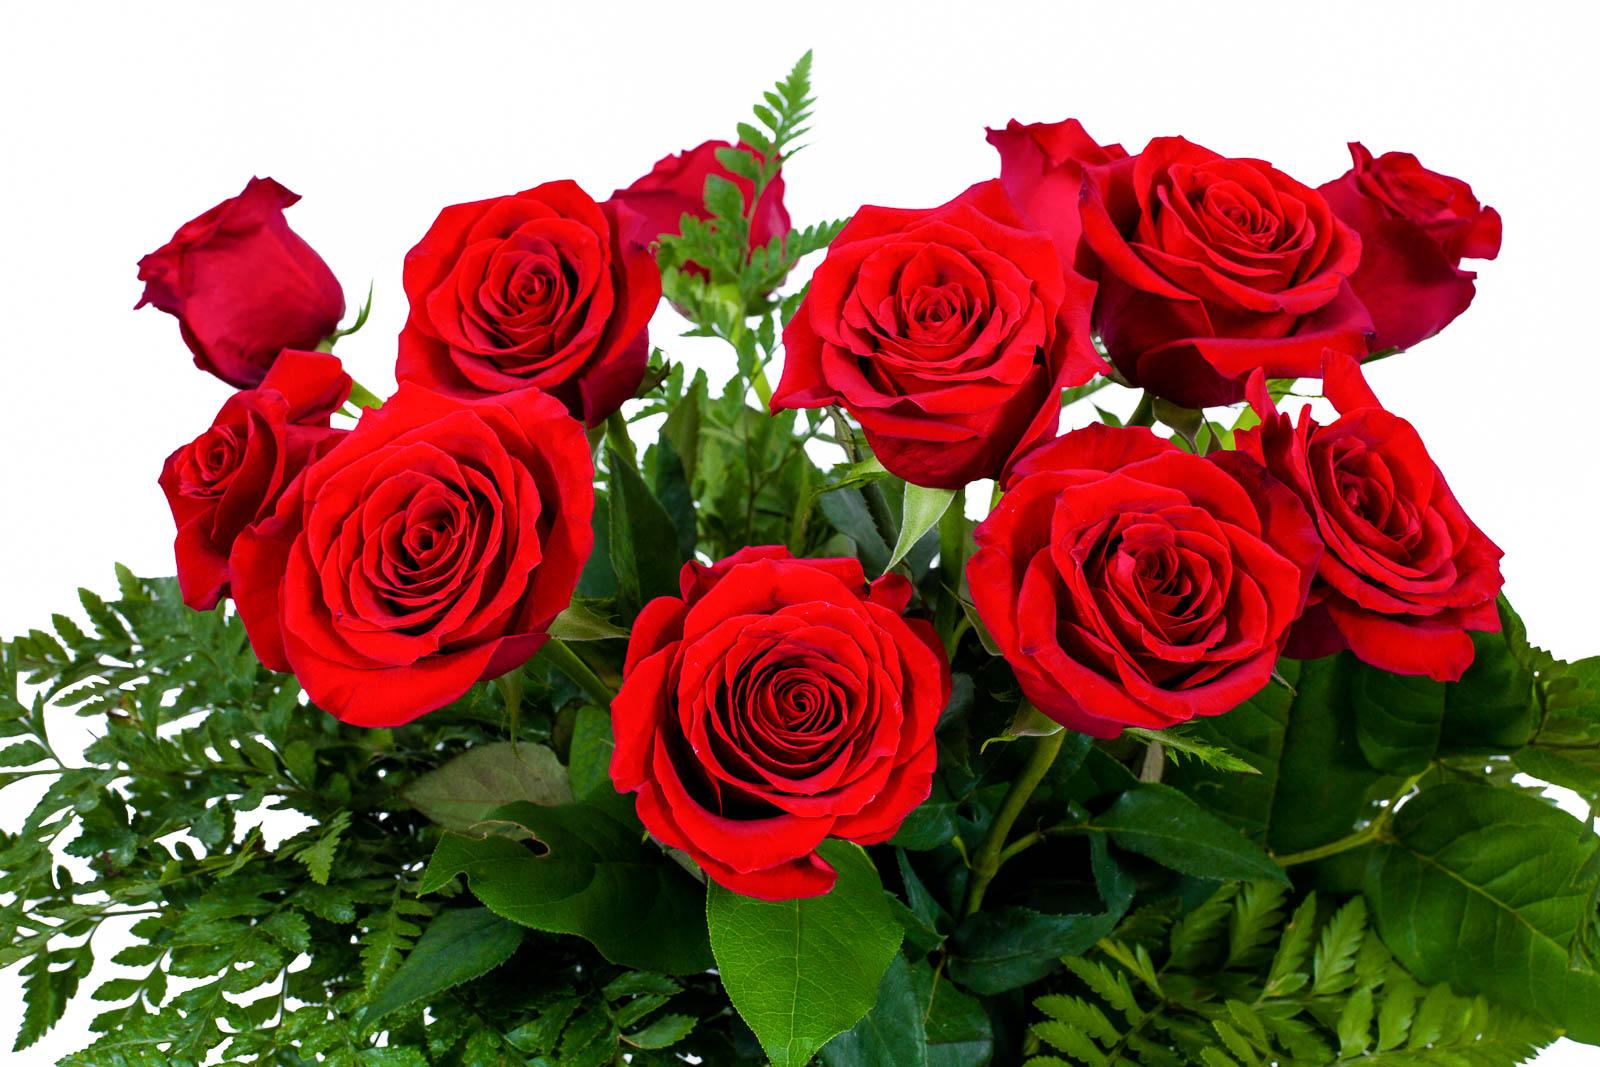 Flwerz 1 dozen roses long stem fresh cut luxury bouquet arrangement flwerz 1 dozen roses long stem fresh cut izmirmasajfo